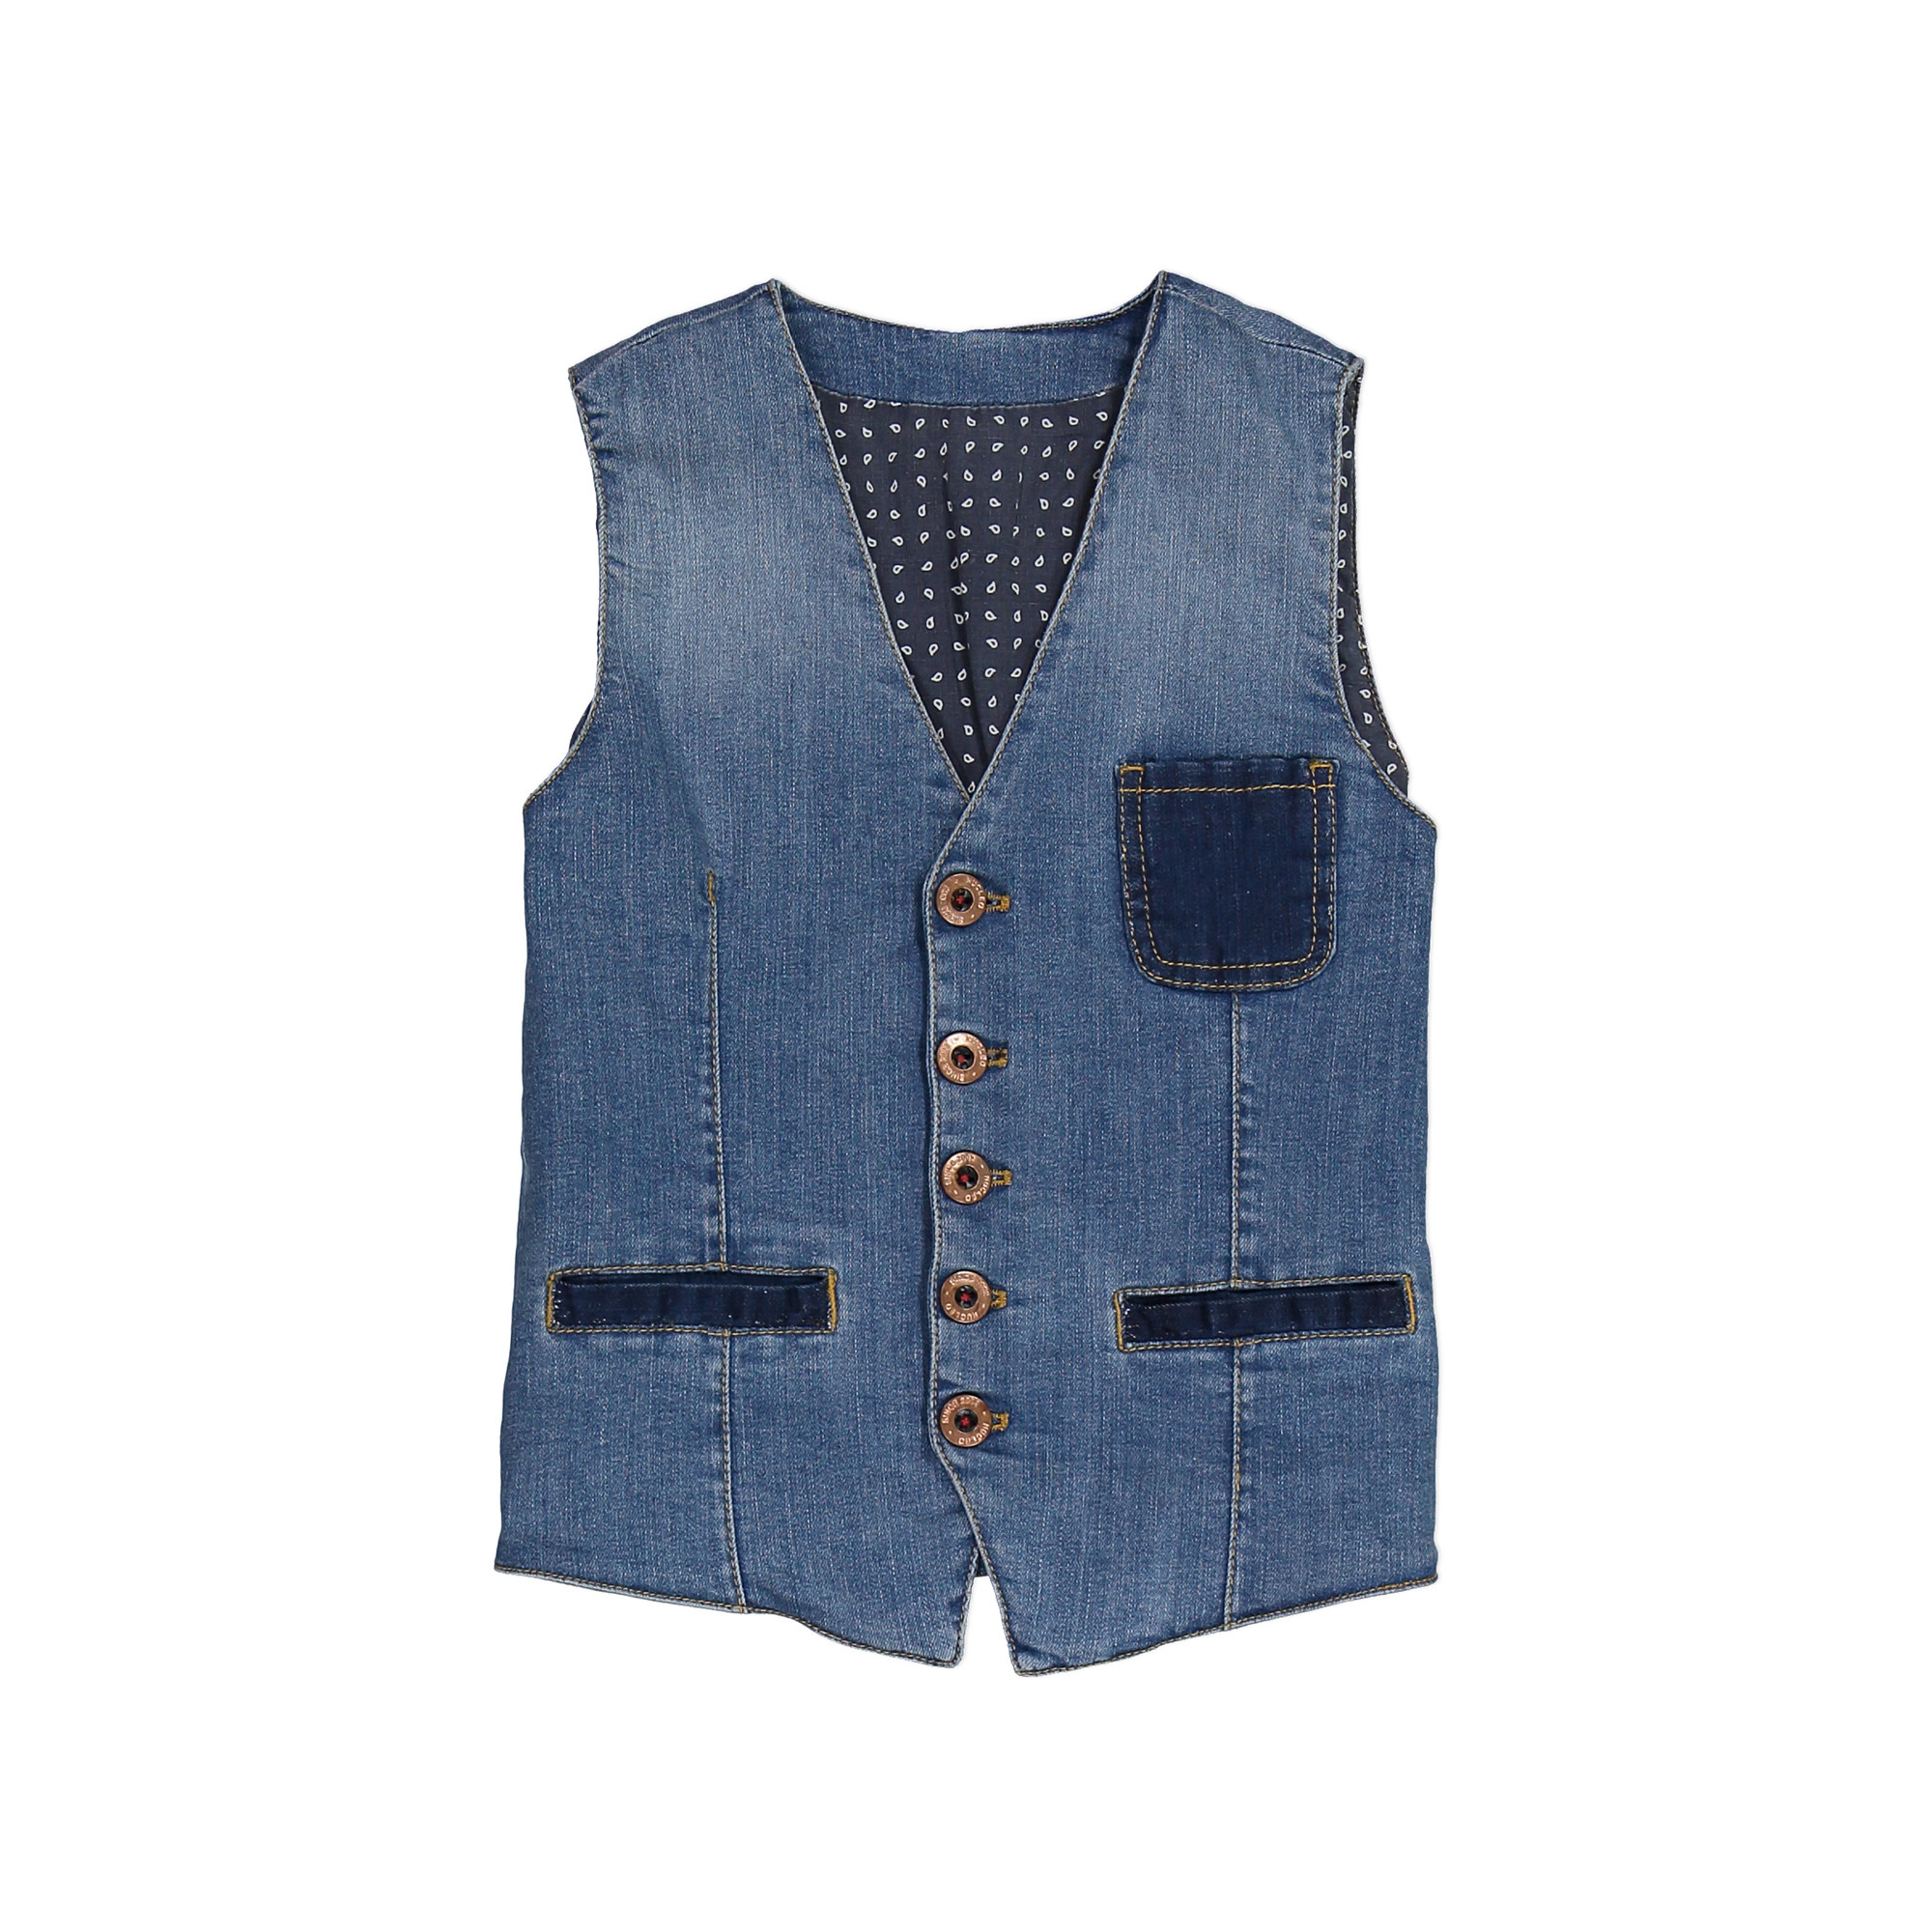 9b697d698a Gilet jeans effetto vintage - Bambino 3-16 Anni | Nucleo Kids Shop